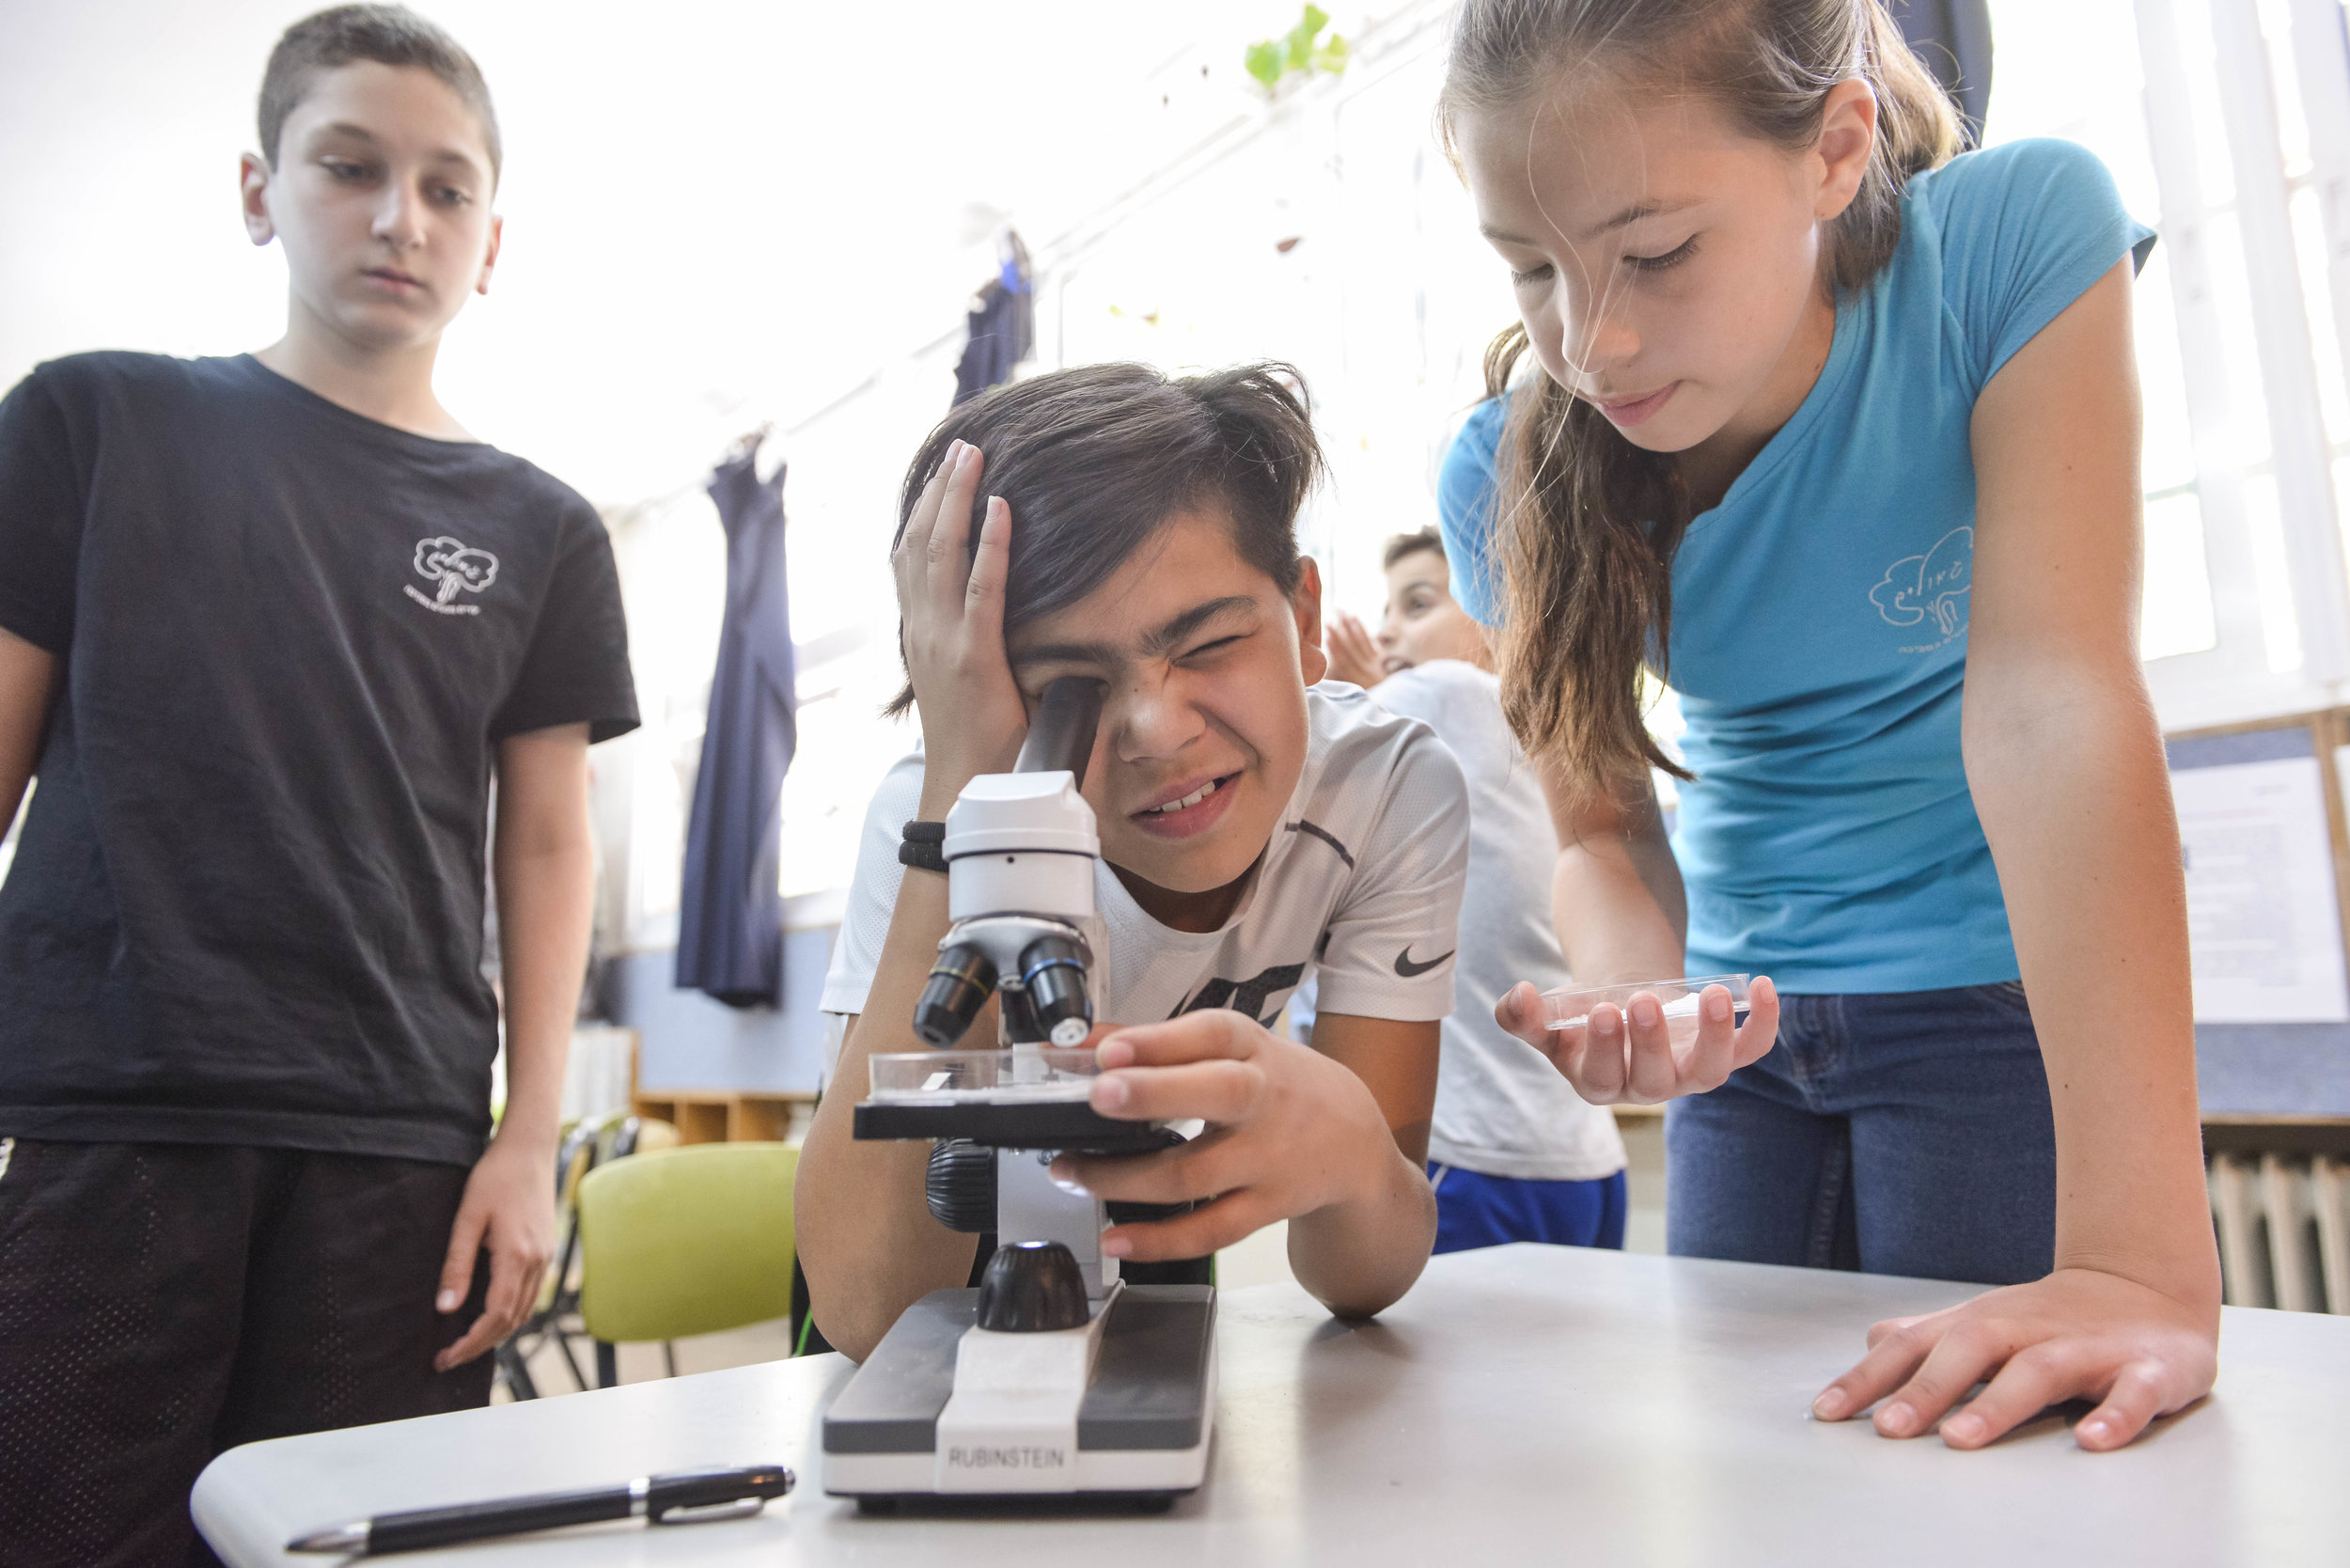 MS or E2k kids at microscope.jpg